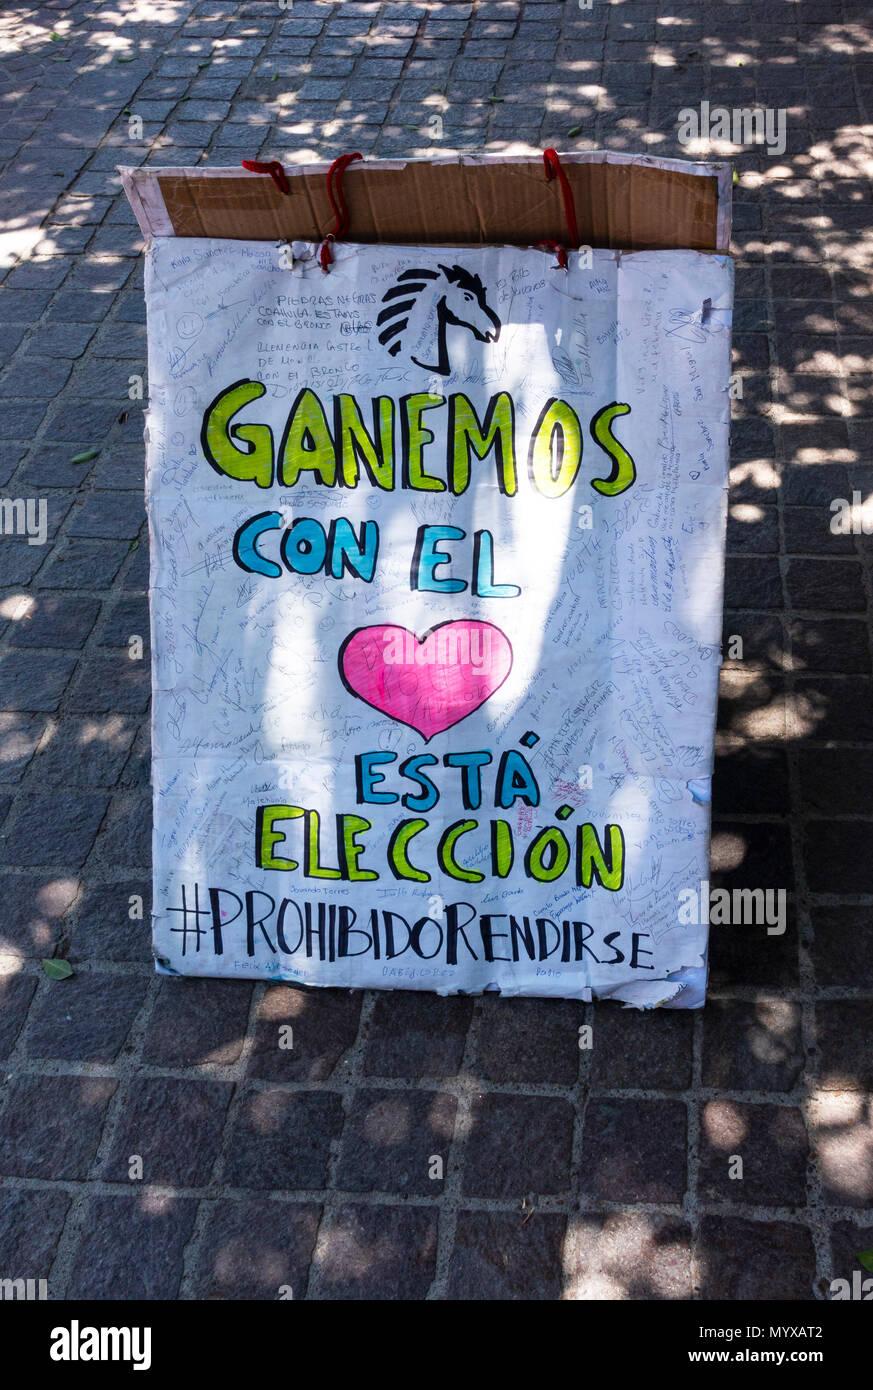 Political posters in La Jardin in the center of San Miguel de Allende, Mexico - Stock Image